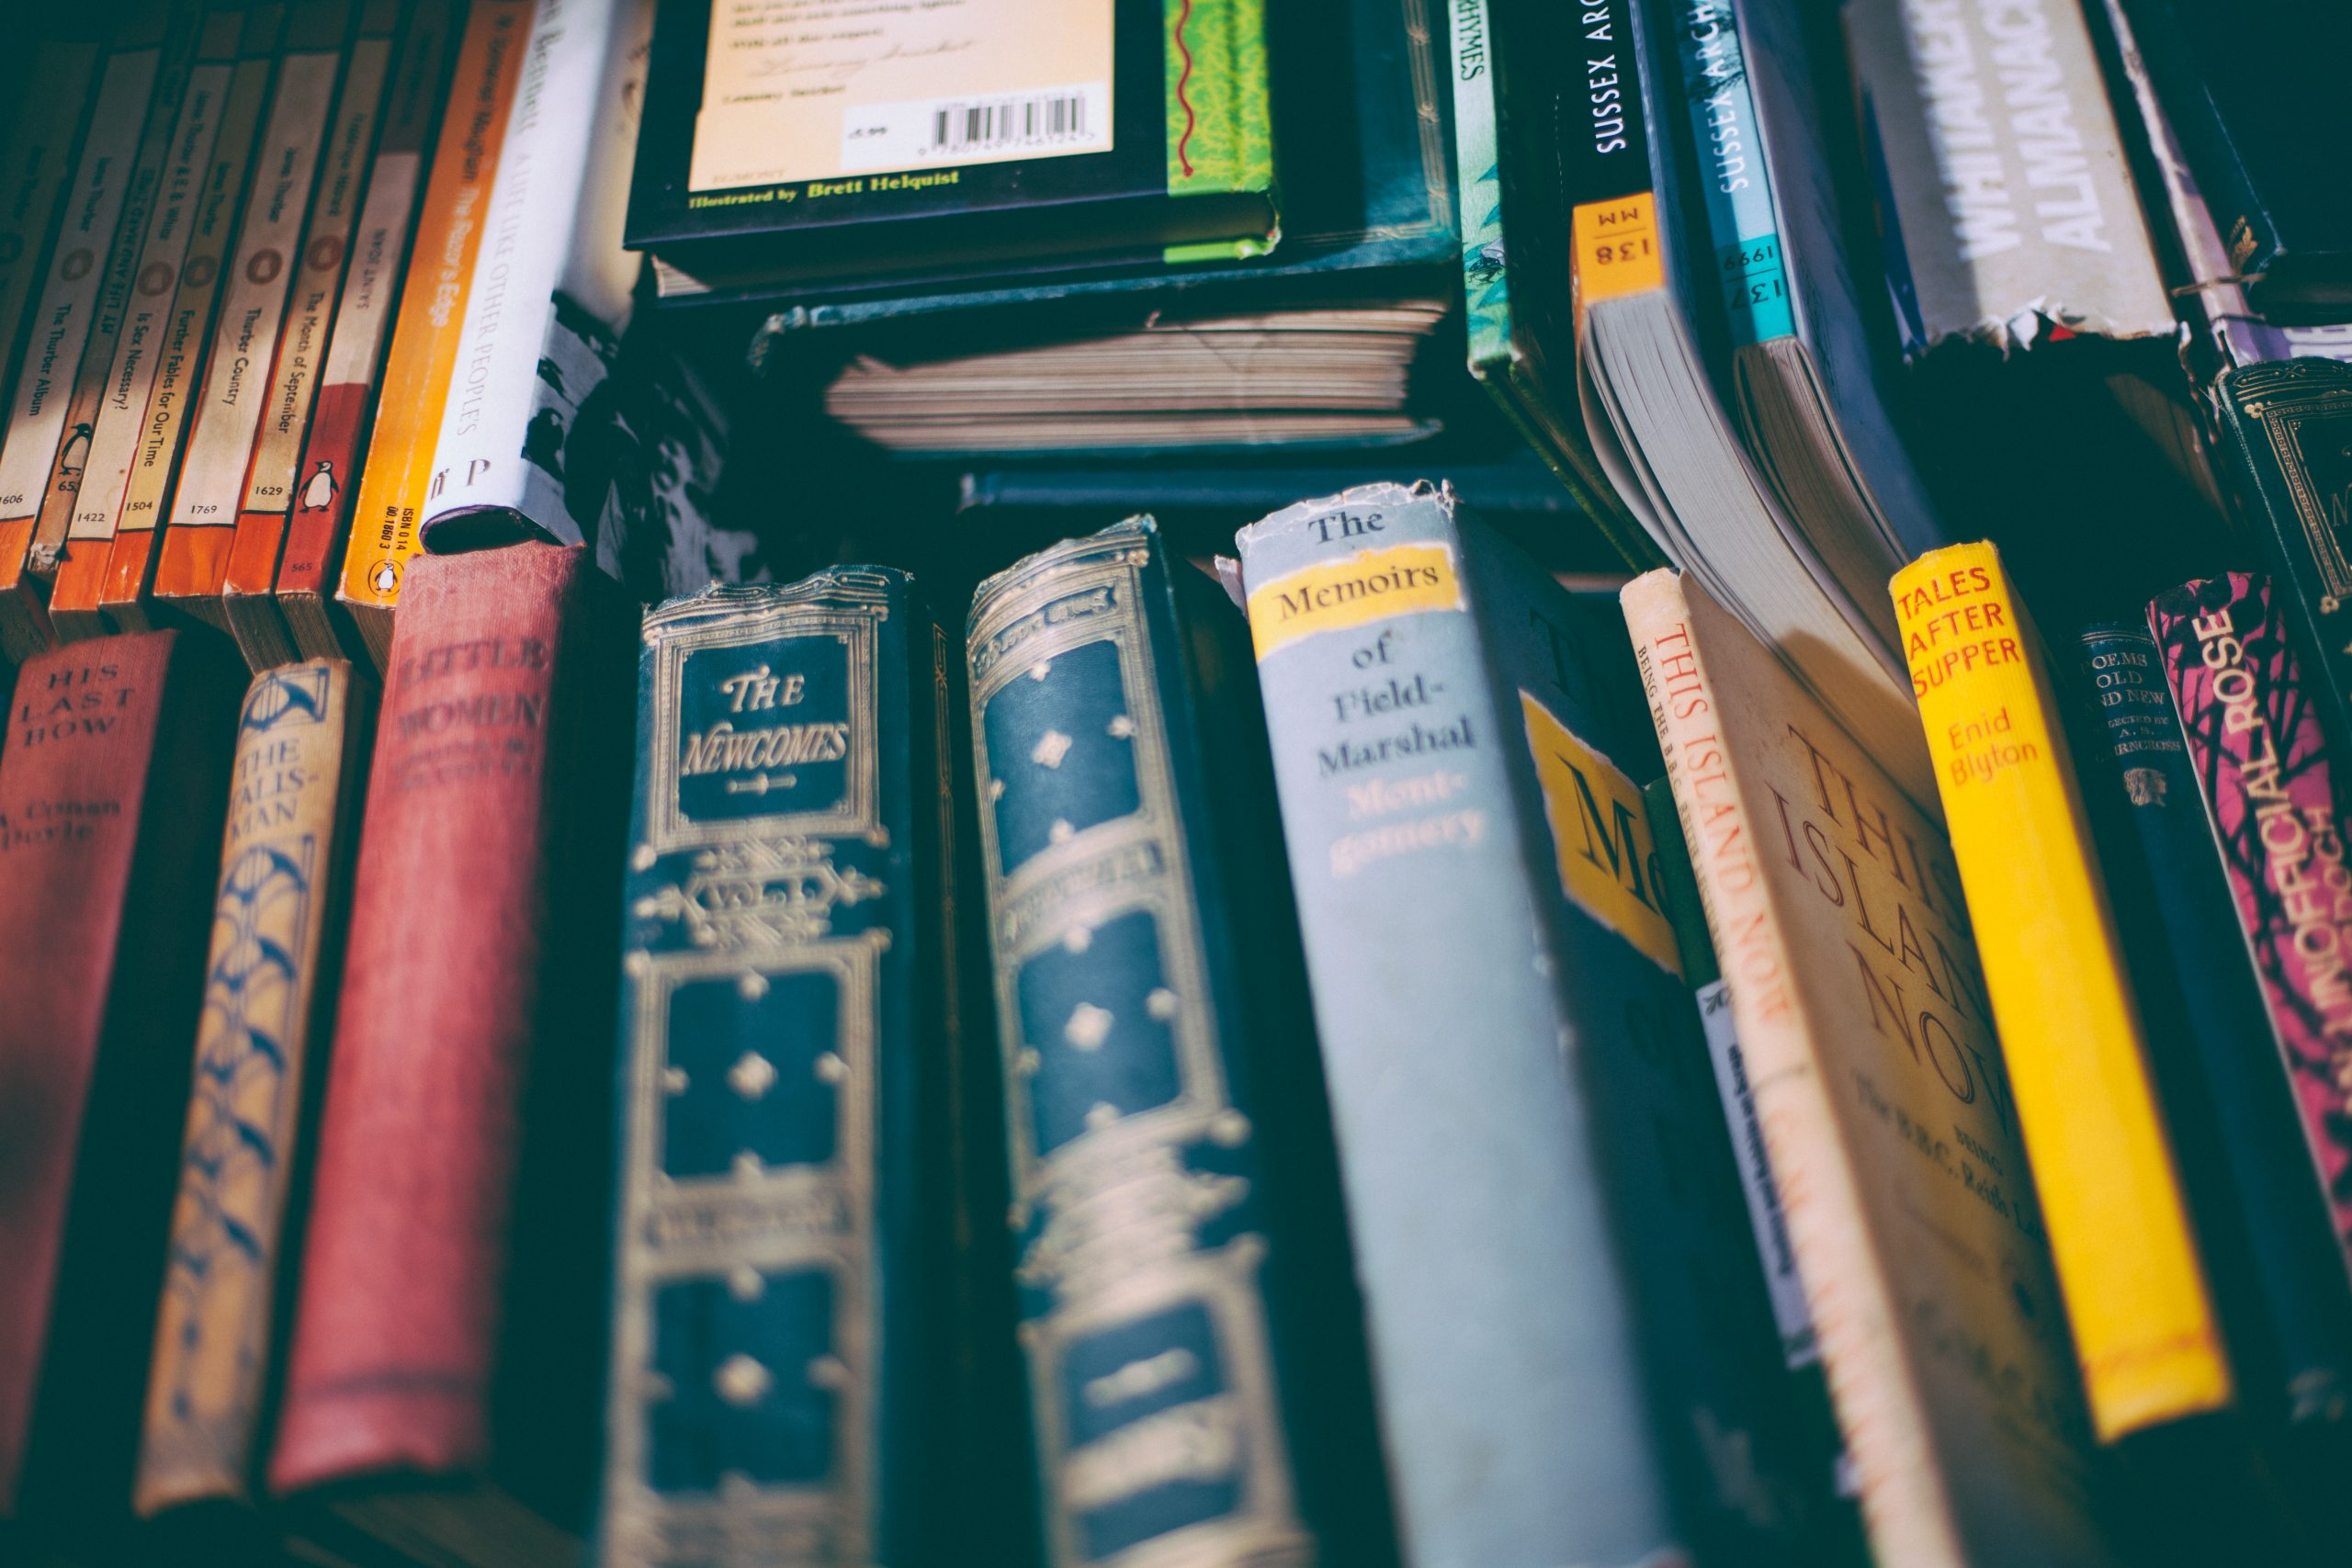 book, book stack, bookcase